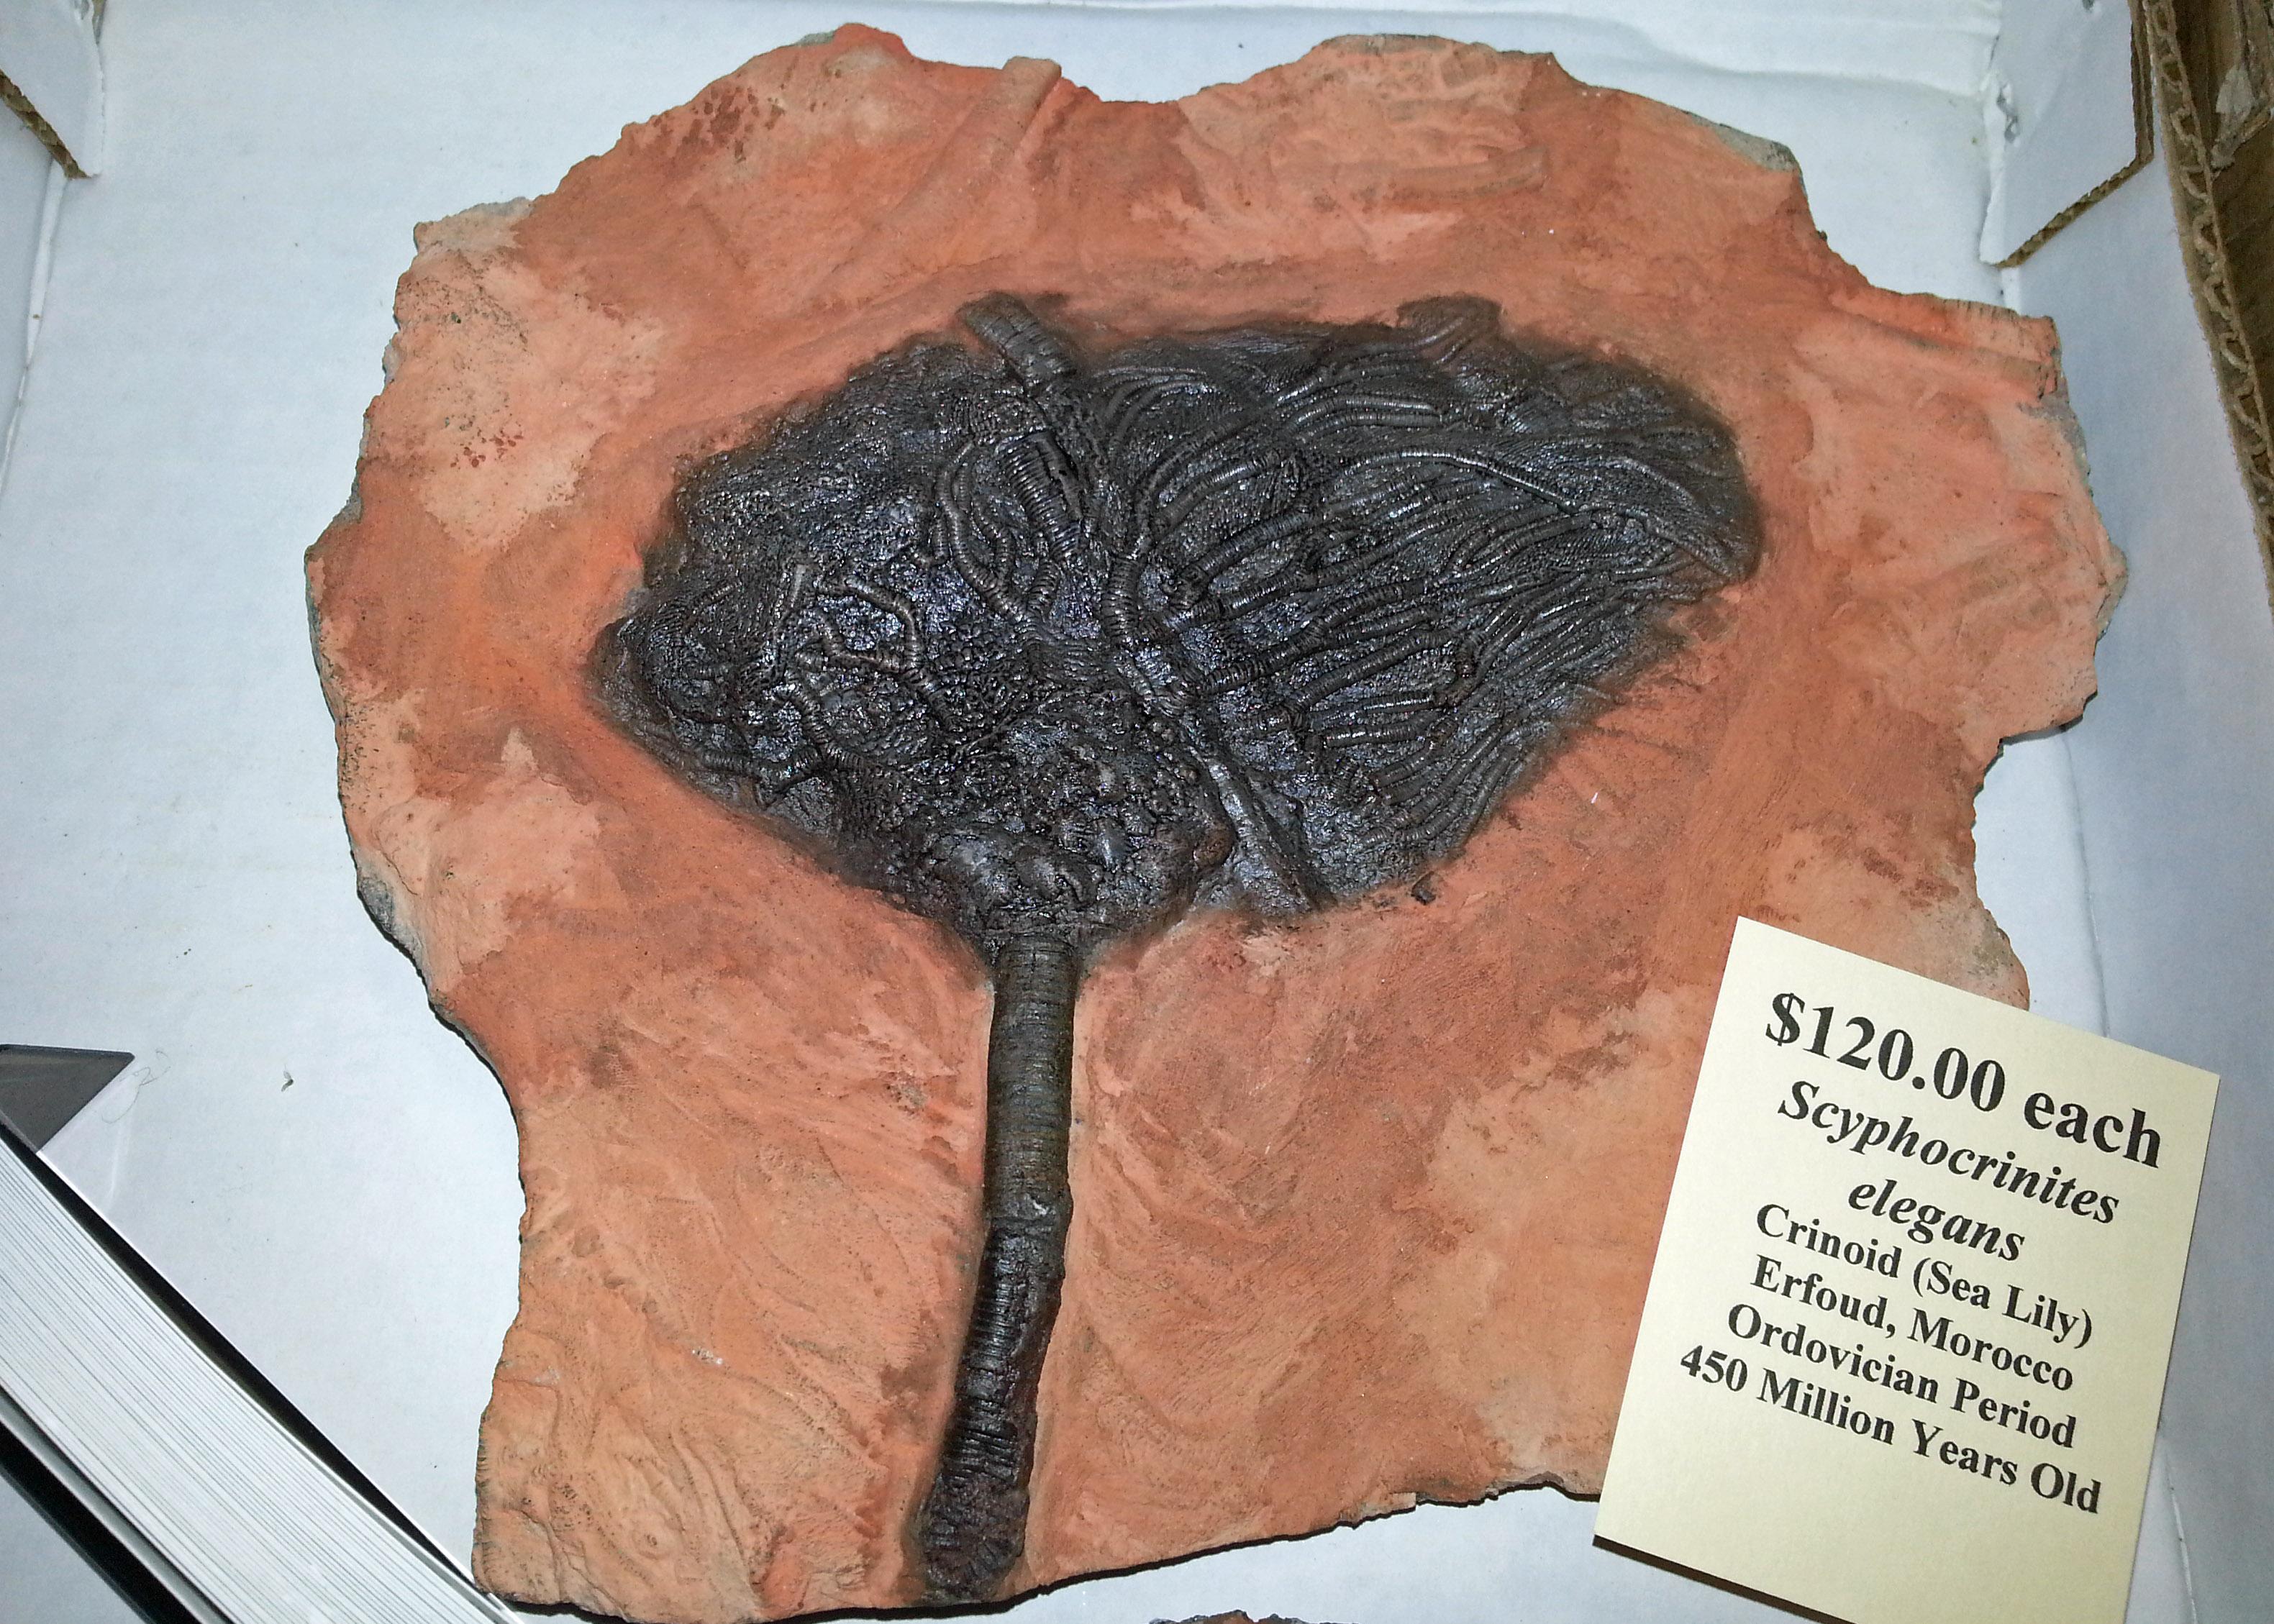 crinoid Scyphocrinites elegans fossil from Morocco